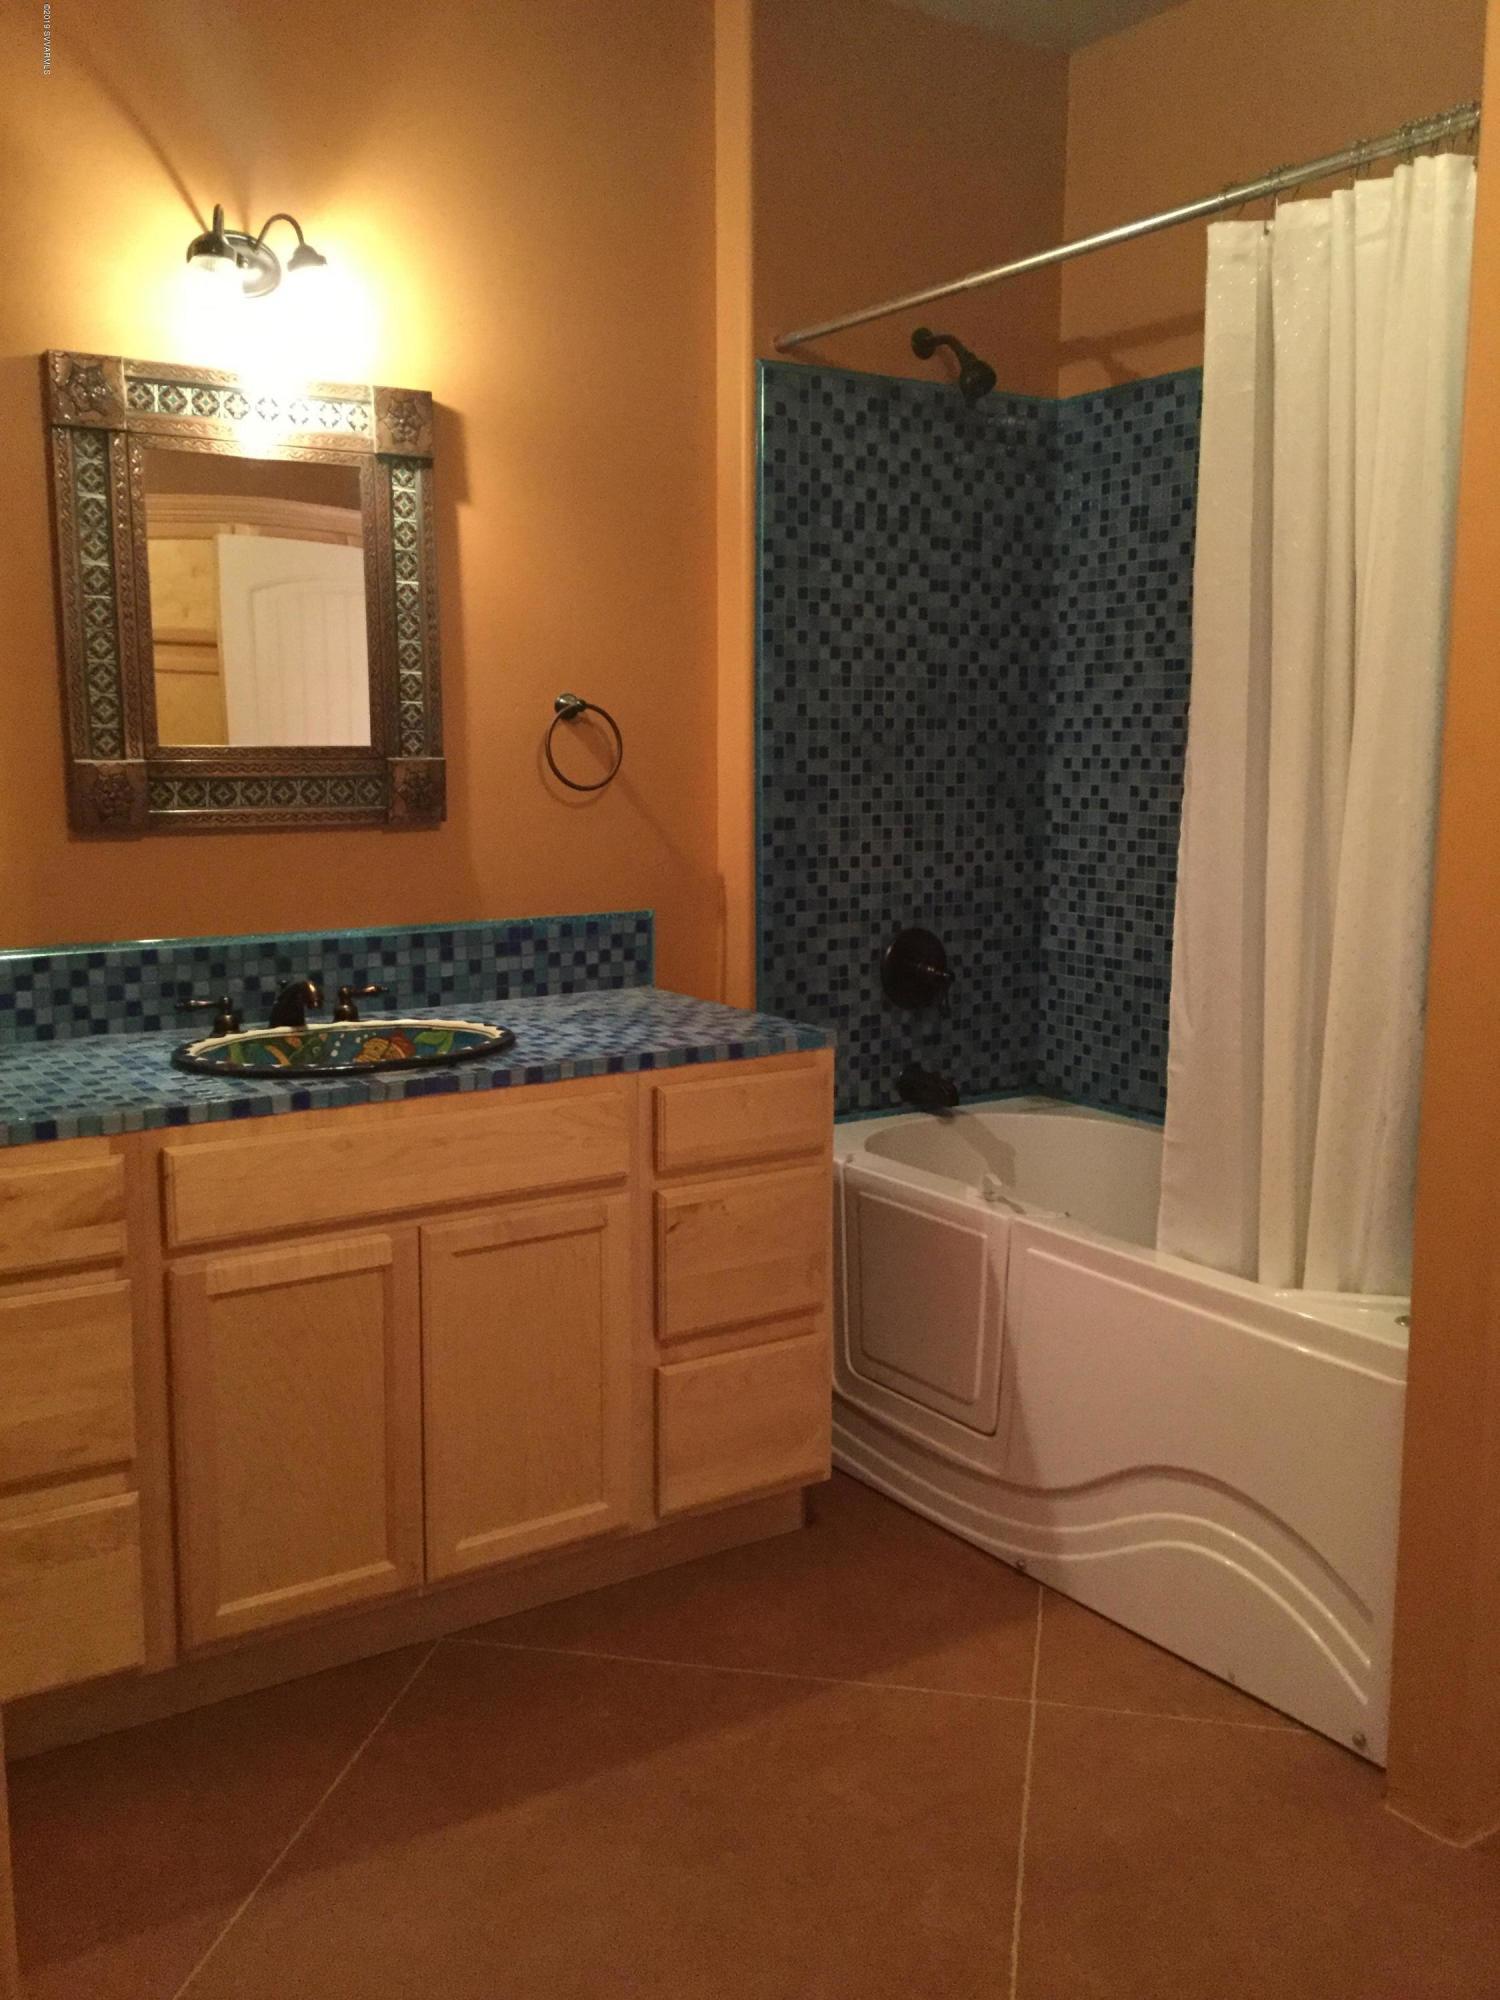 1350 N Old Clarkdale Hwy Cottonwood, AZ 86326